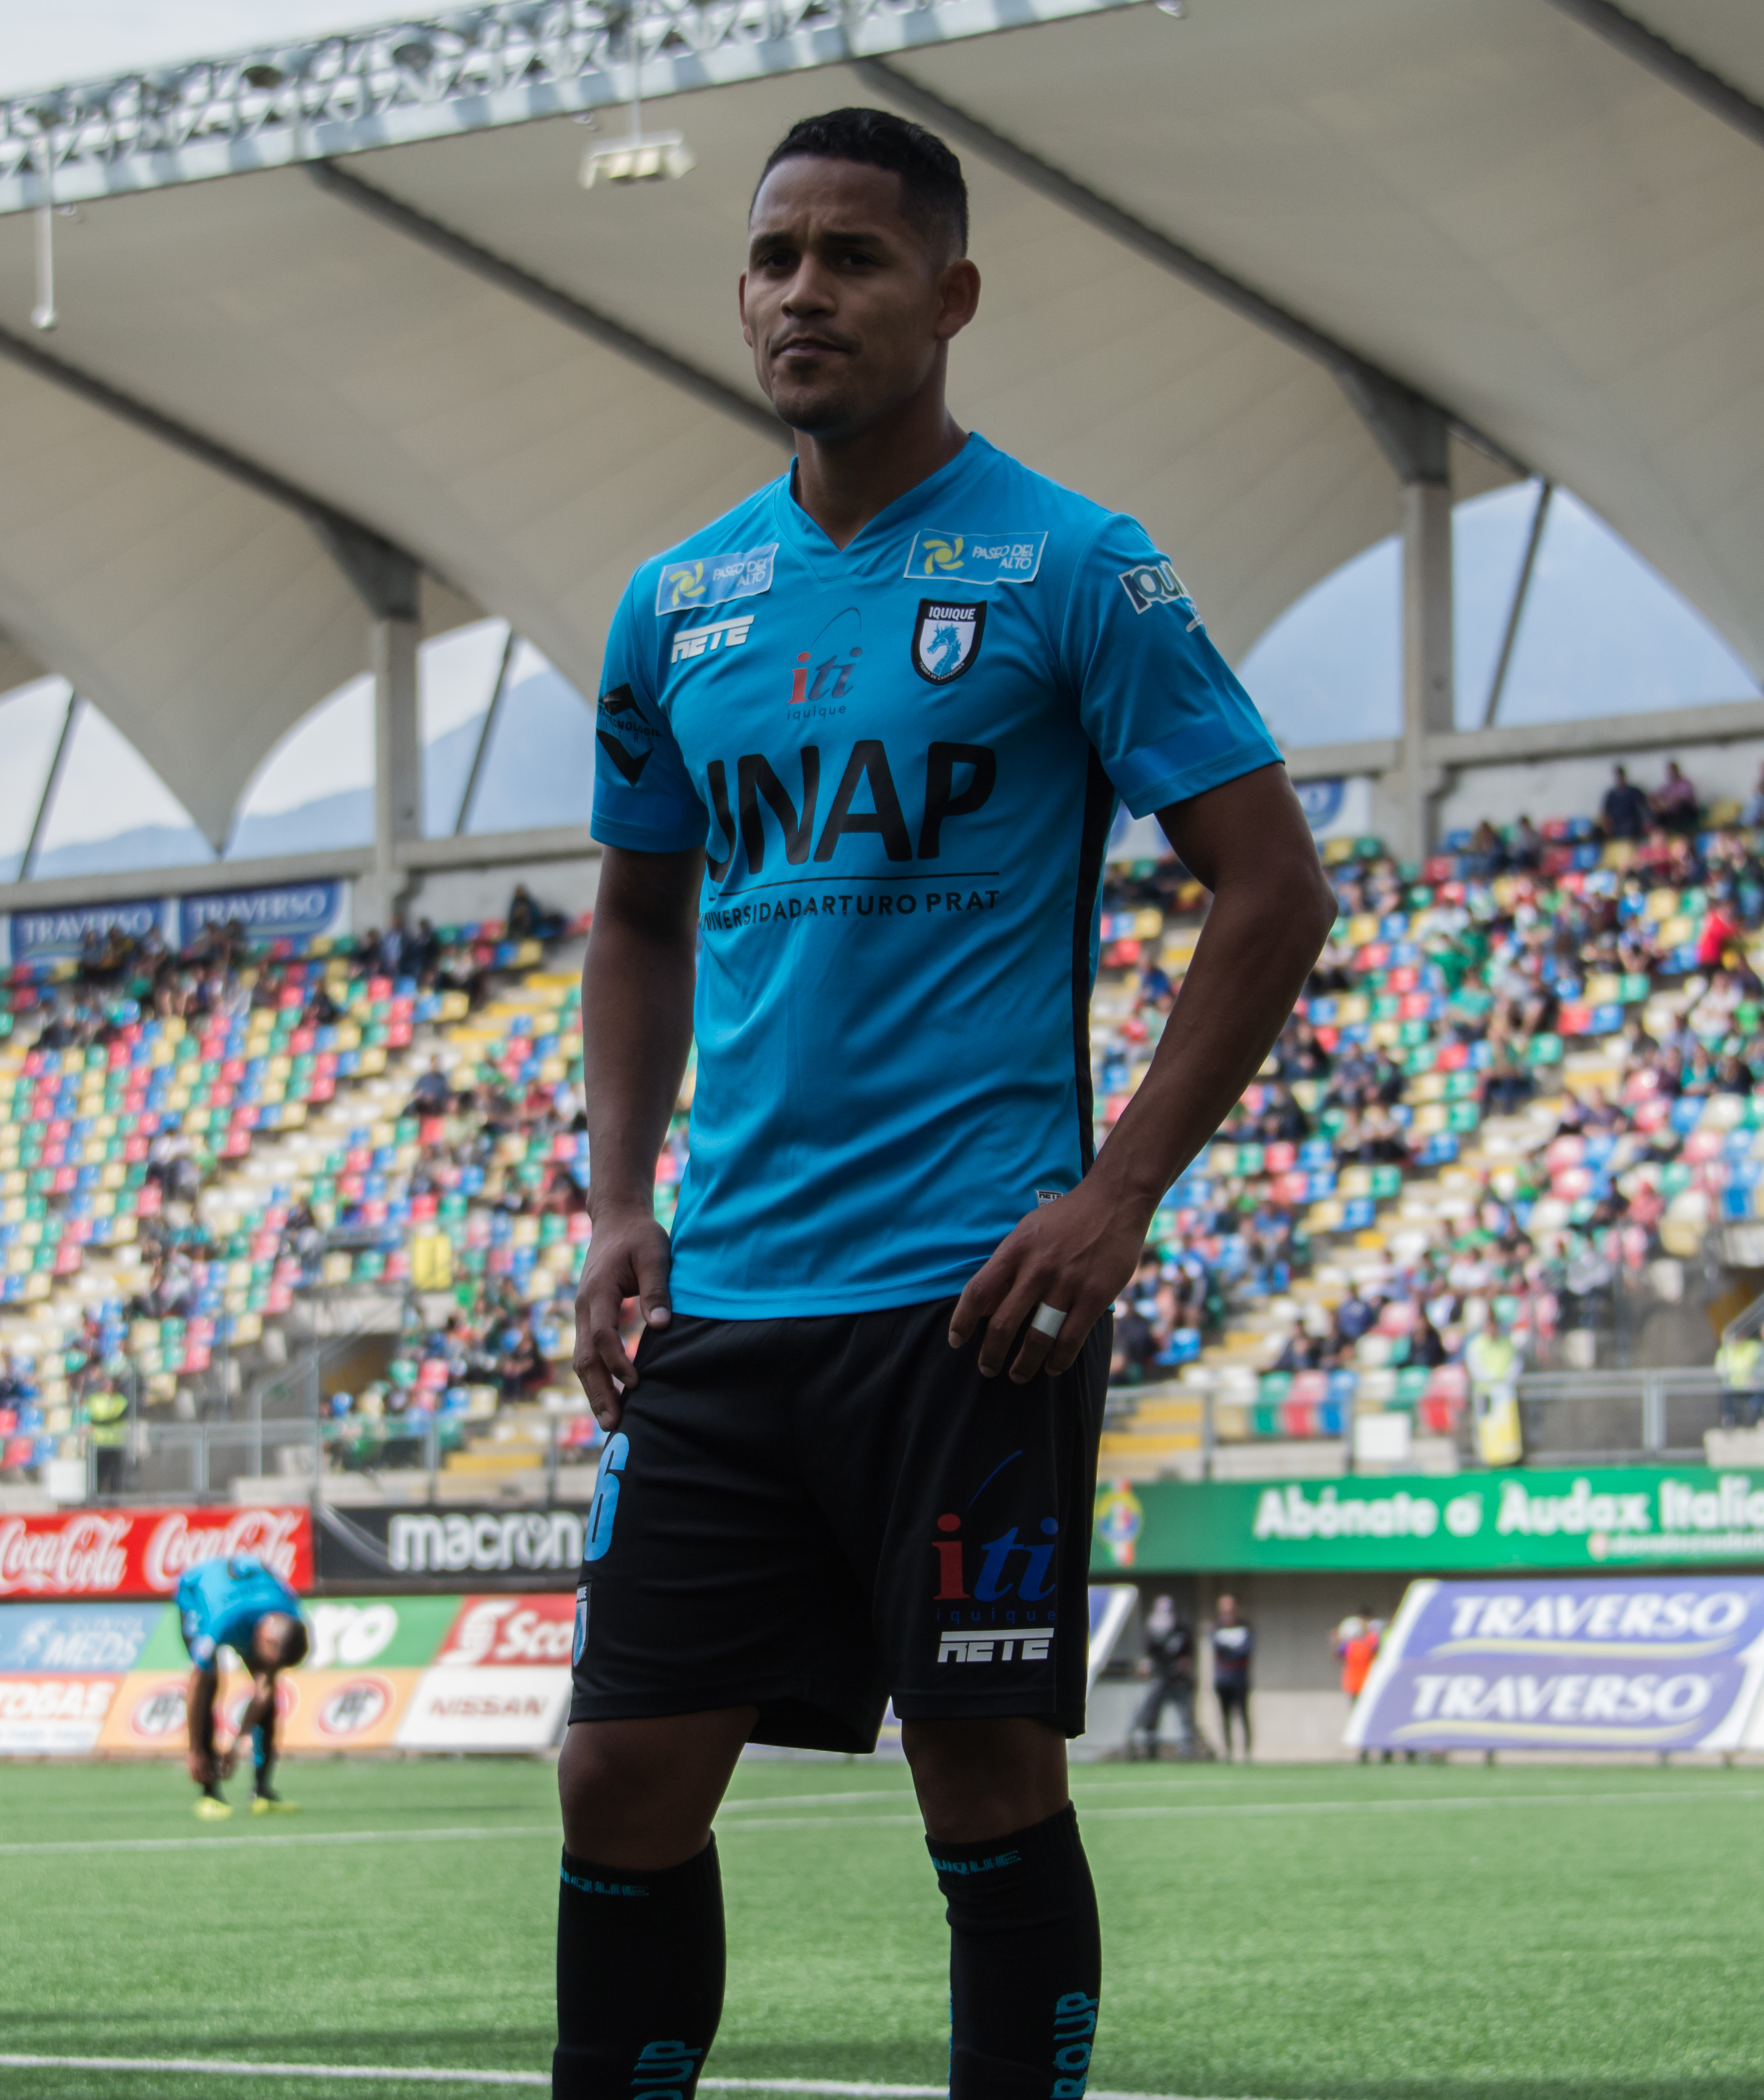 File:Audax Italiano - Deportes Iquique, 2018-09-22 - Edwuin Pernía - 02.jpg - Wikimedia Commons